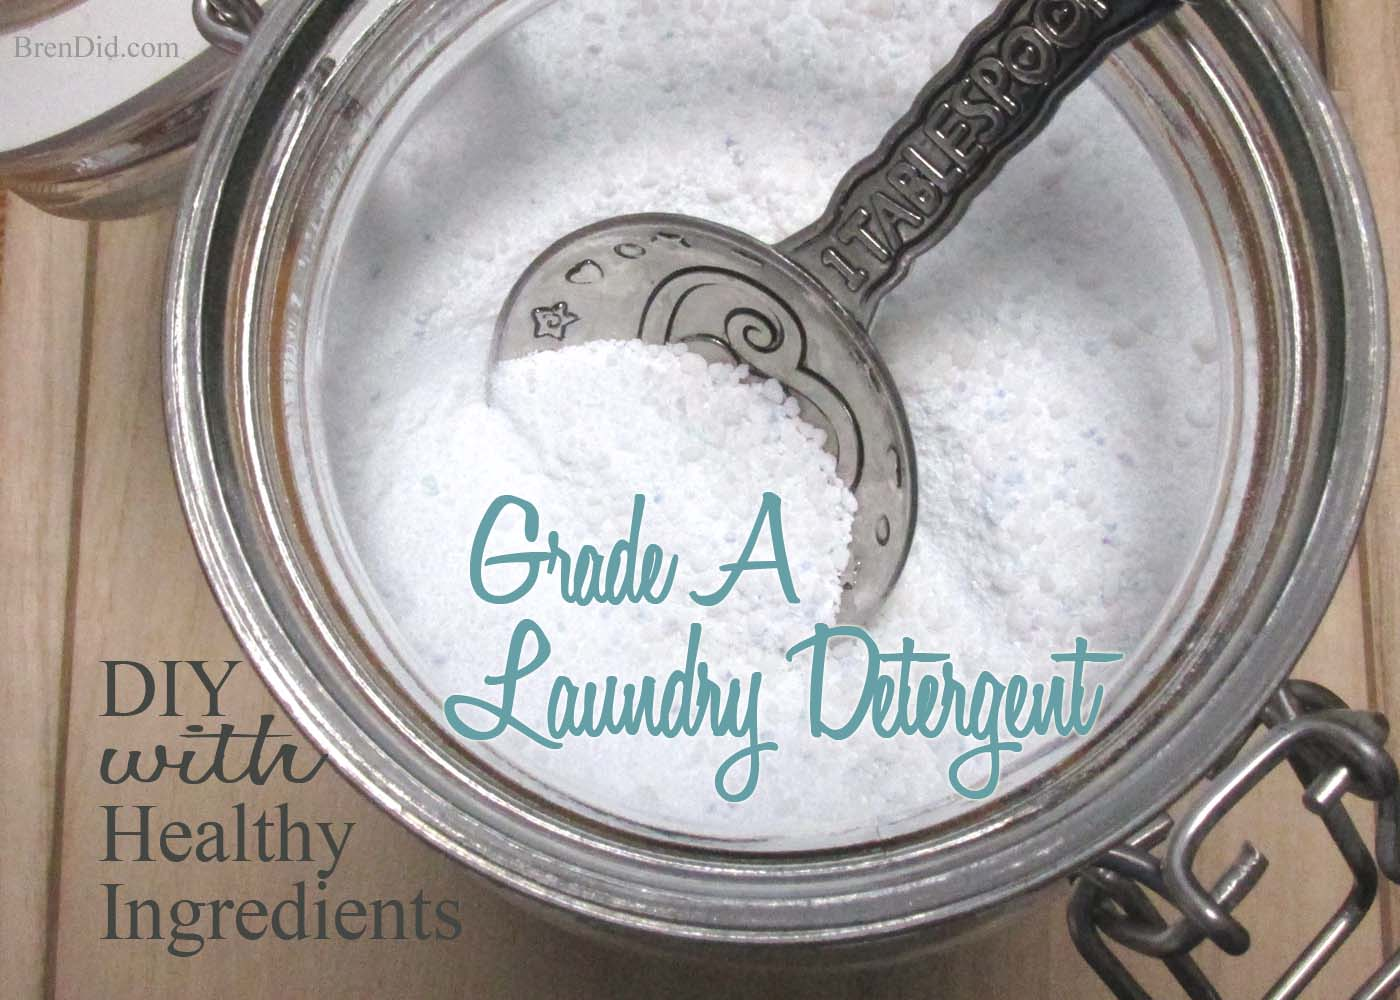 BrenDid-GradeA-Laundry-Header-Horizontal